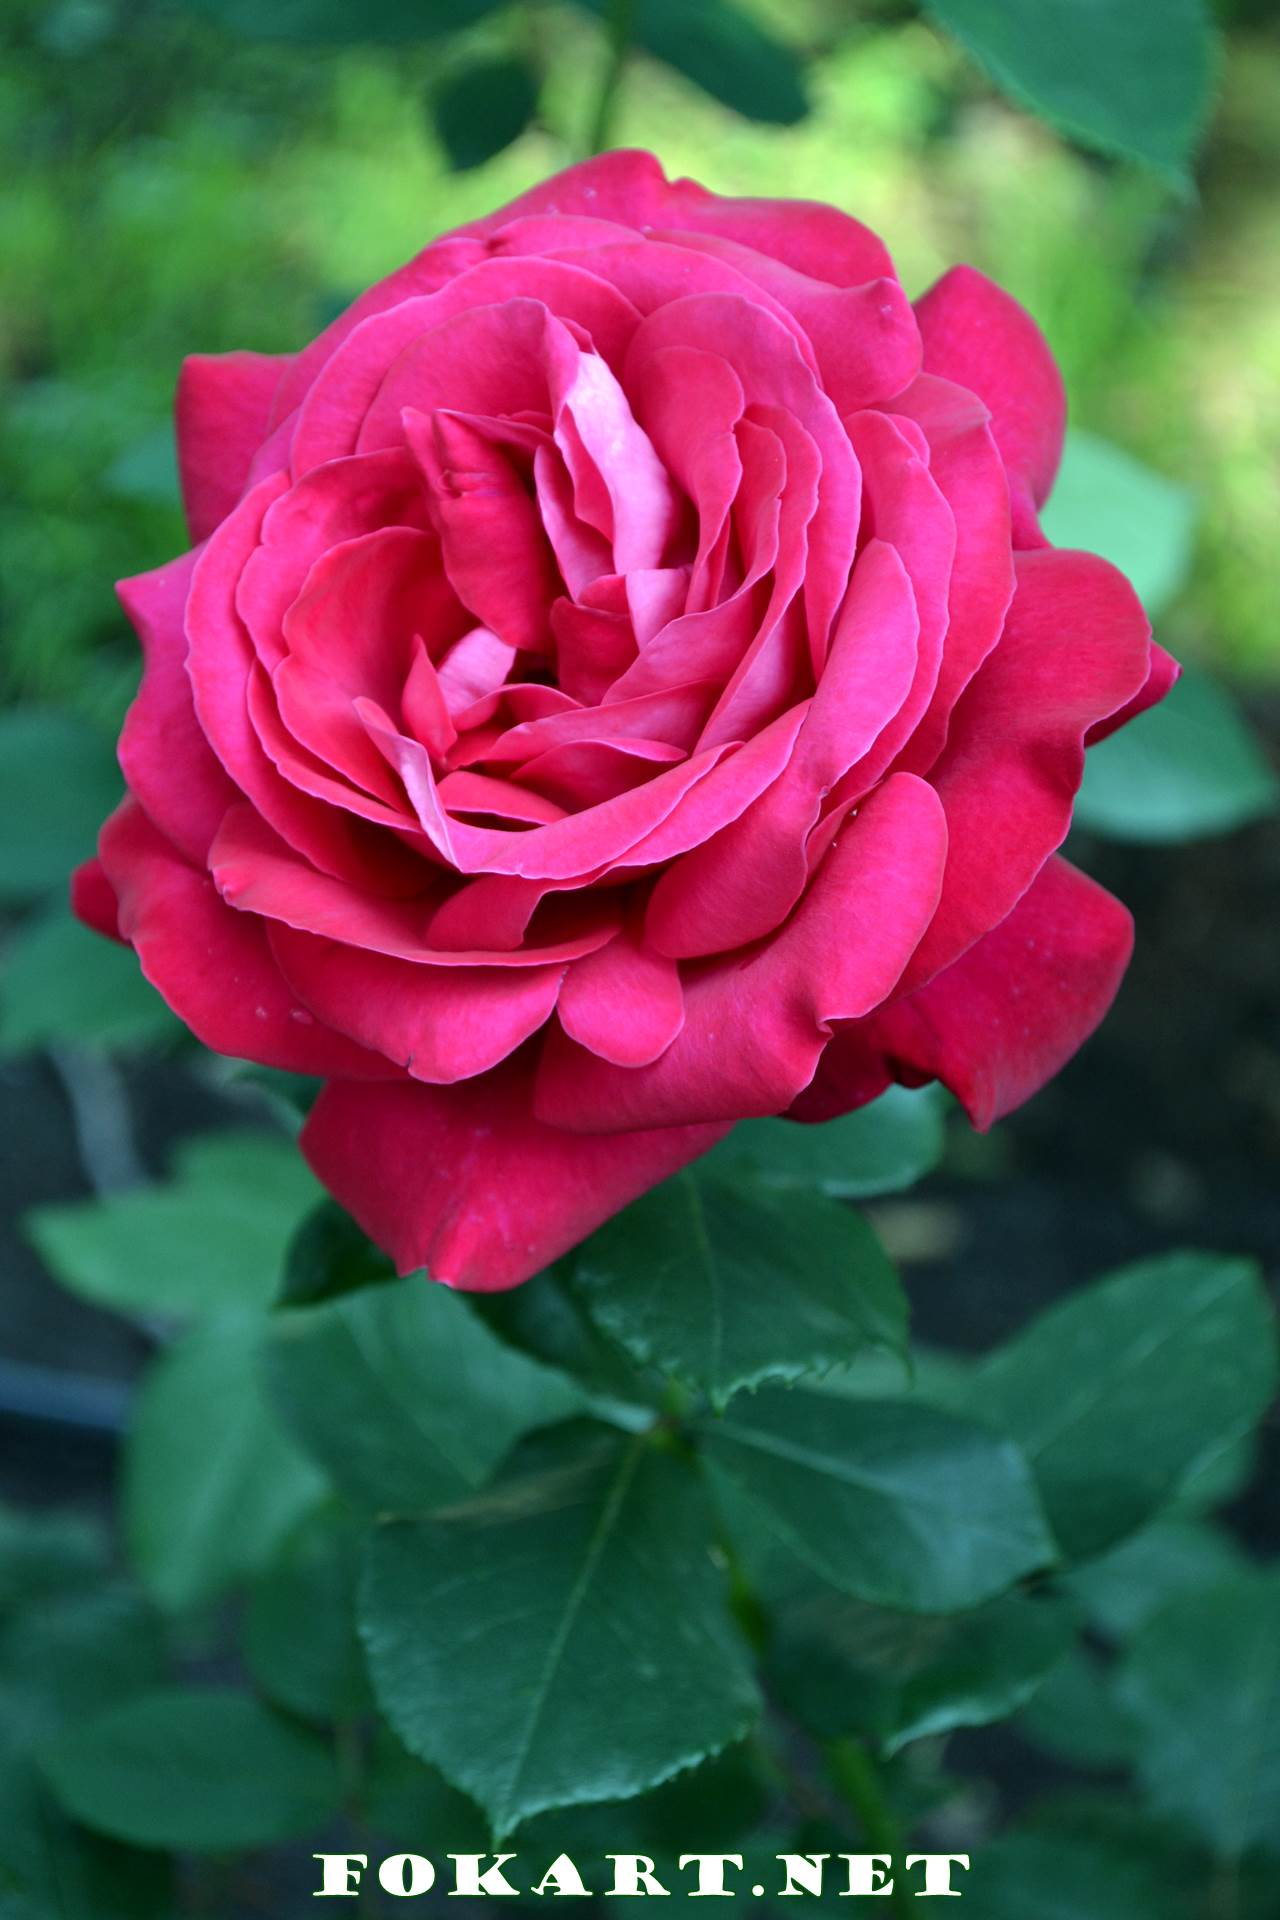 Тёмно-розовая роза в саду